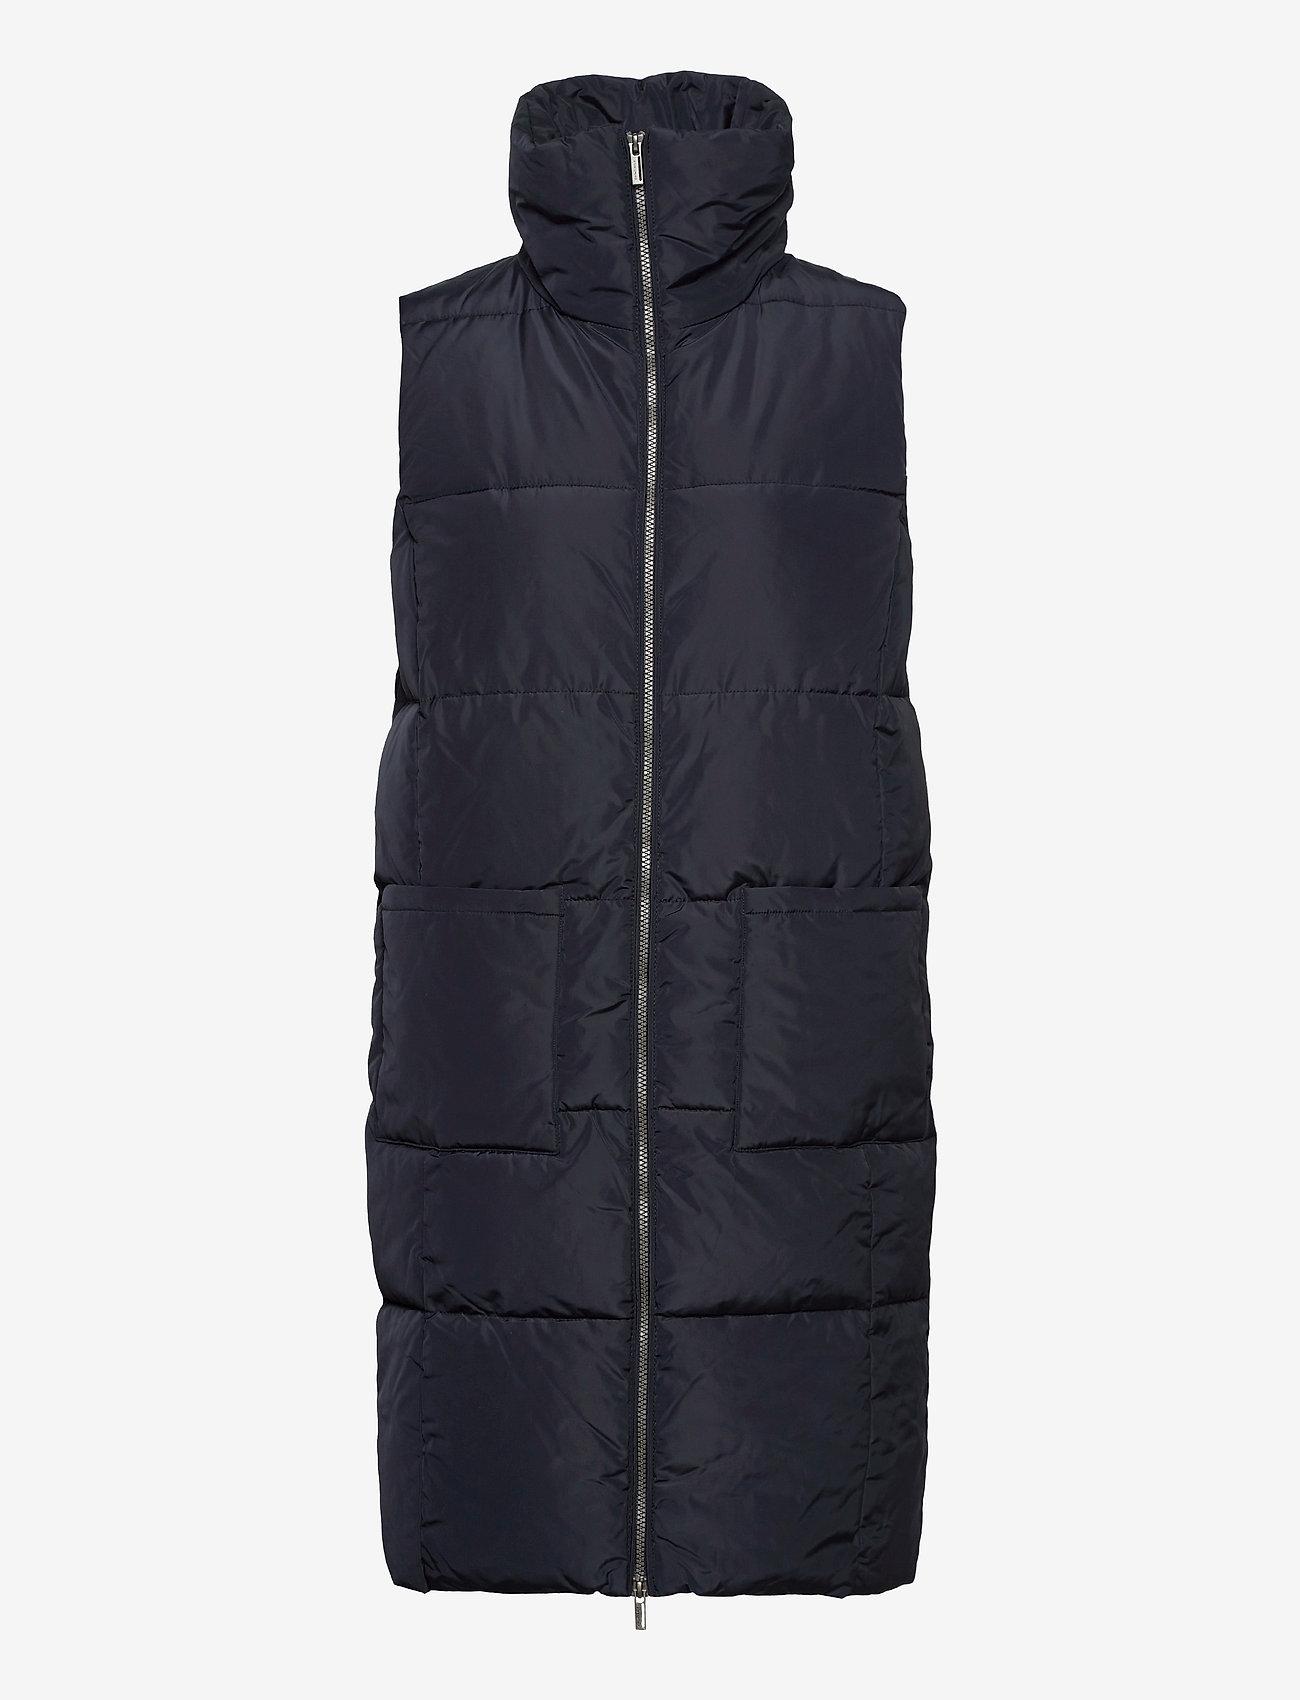 Soyaconcept - SC-NINA - puffer vests - dark navy - 0